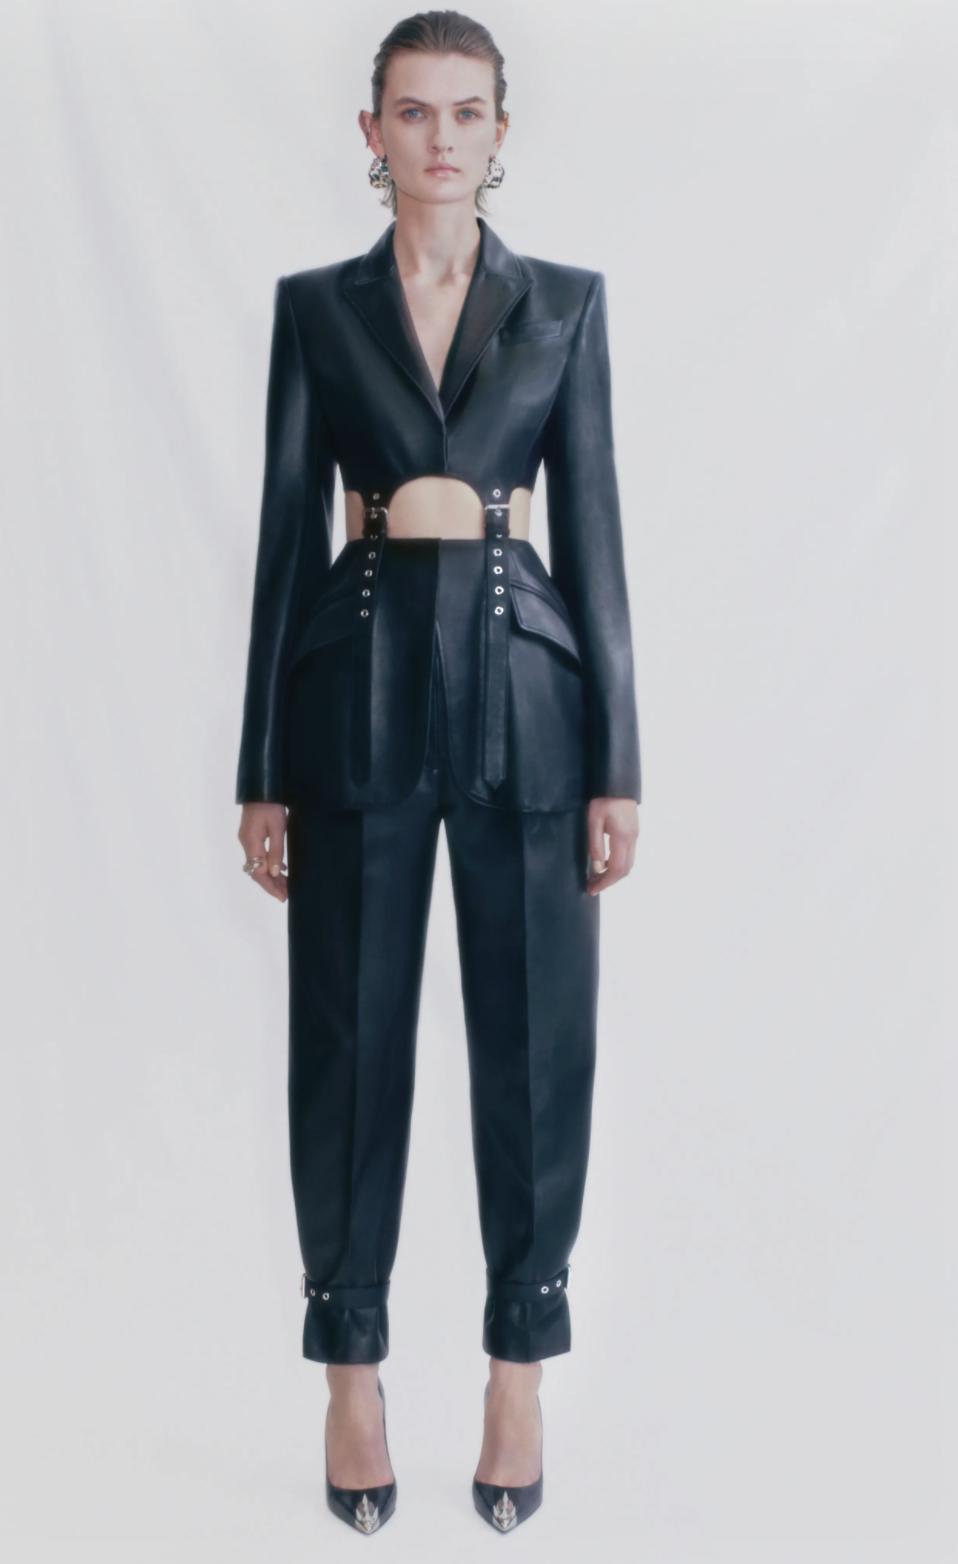 2021 fashion trends, cutouts,